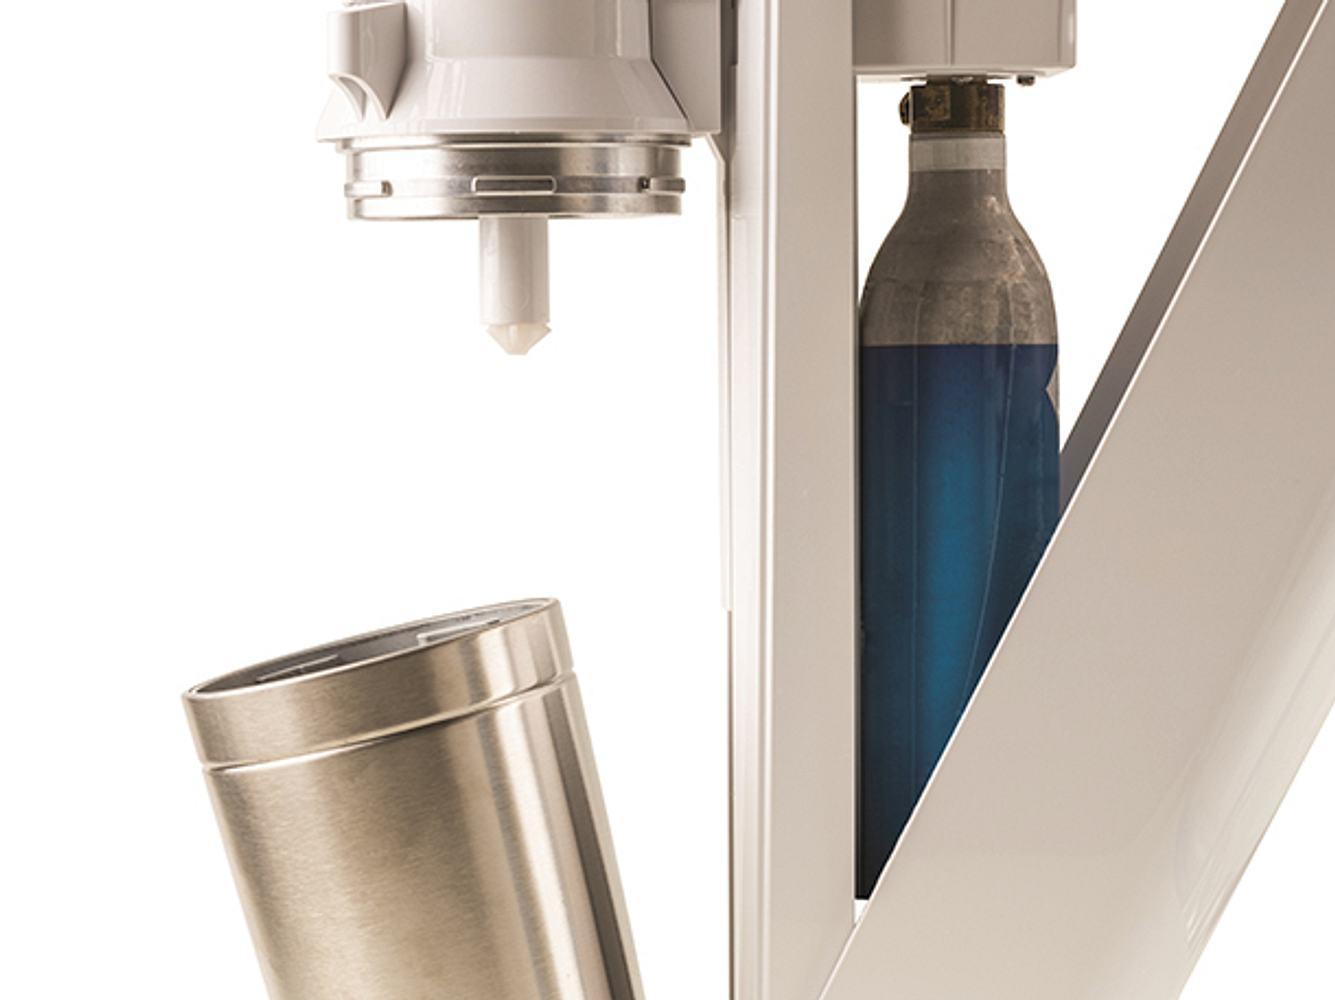 Sodastream reinigen - so gehts